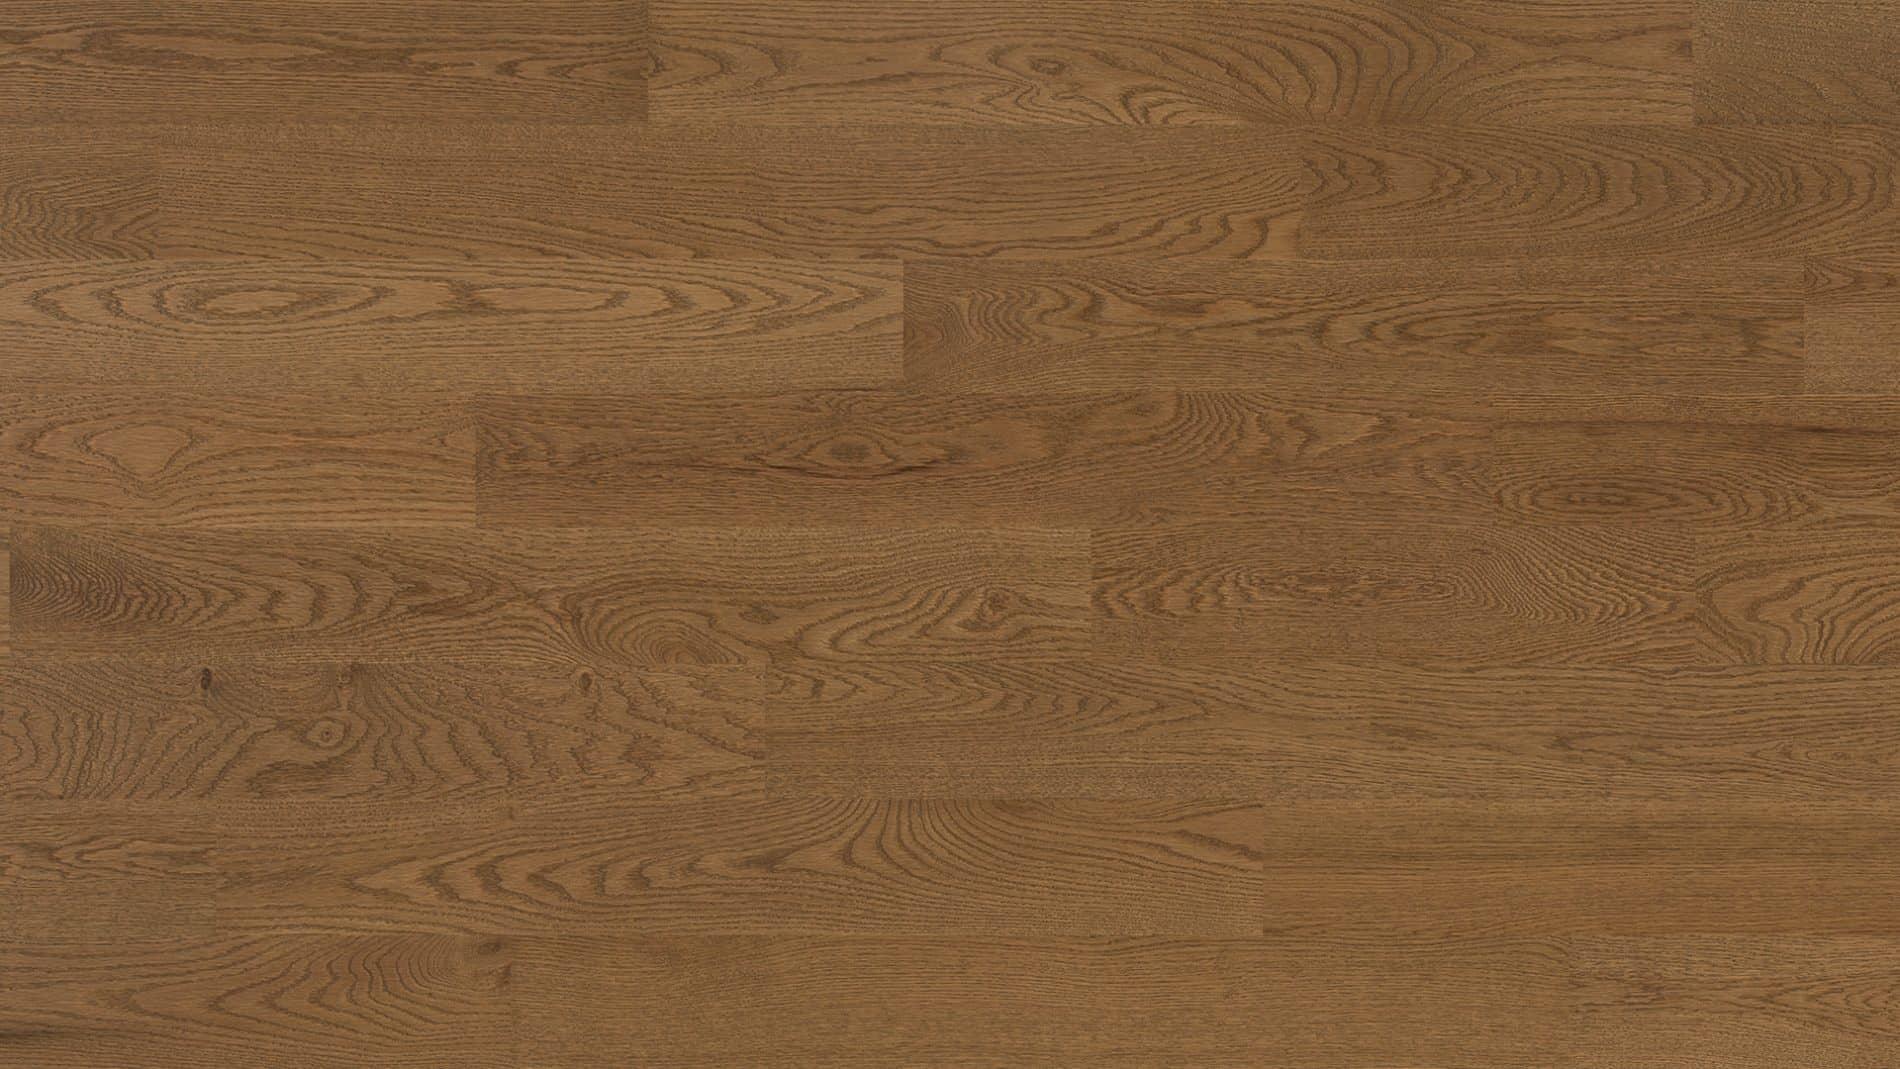 Hardwood floor | Red oak wire brushed madero